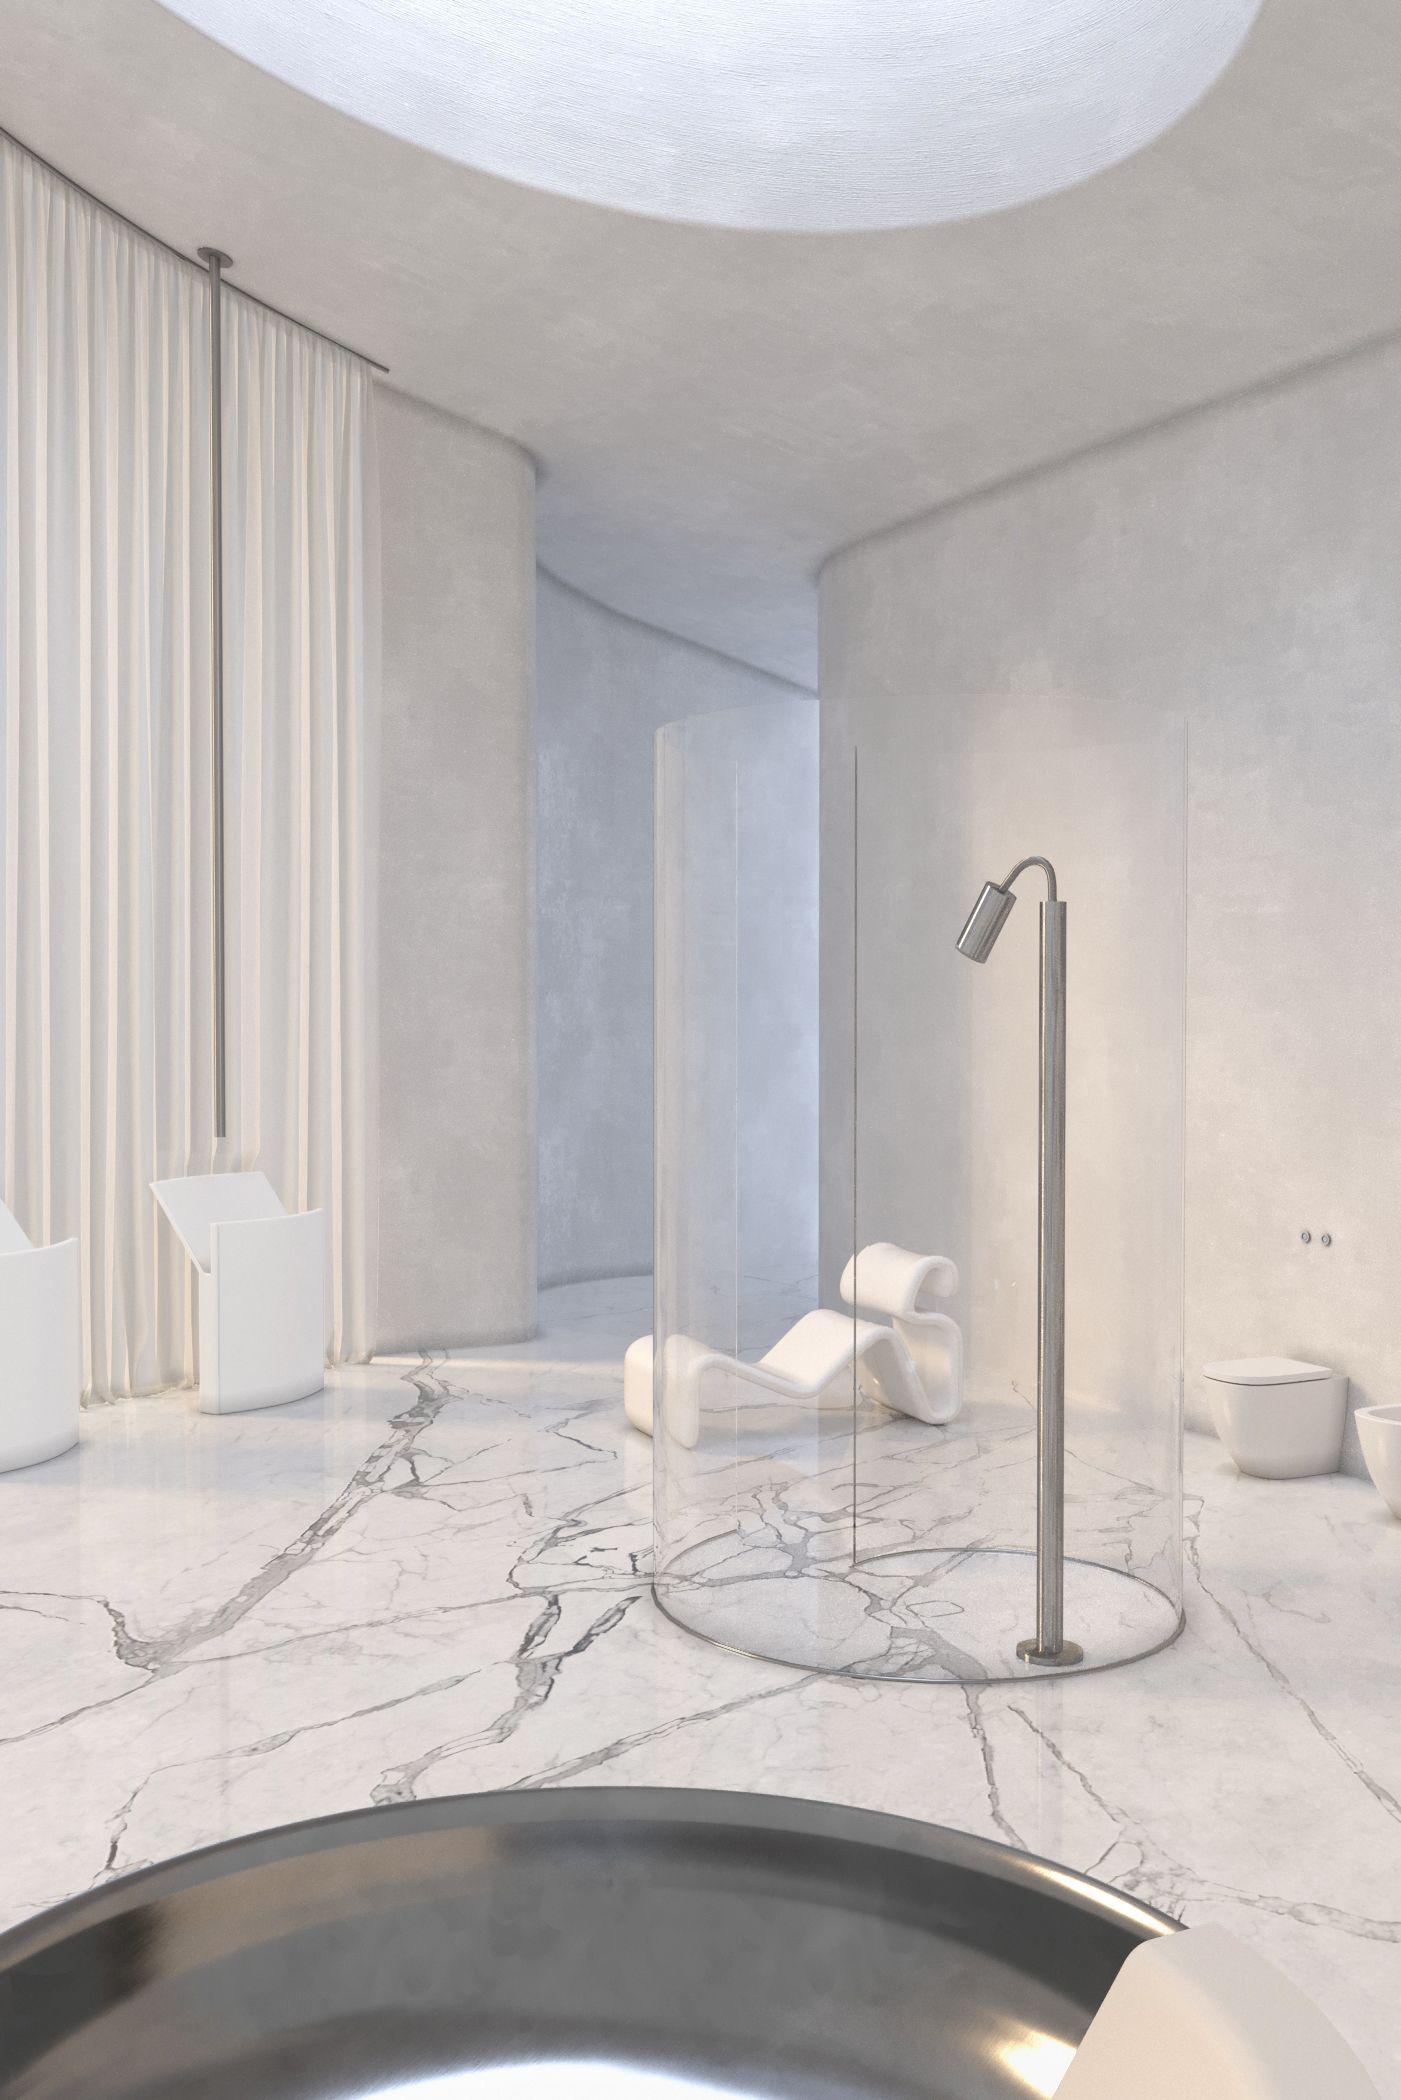 The Kyiv-based interior design studio Rina Lovko Studio led by Ukranian architect and designer Rina Lovko has designed